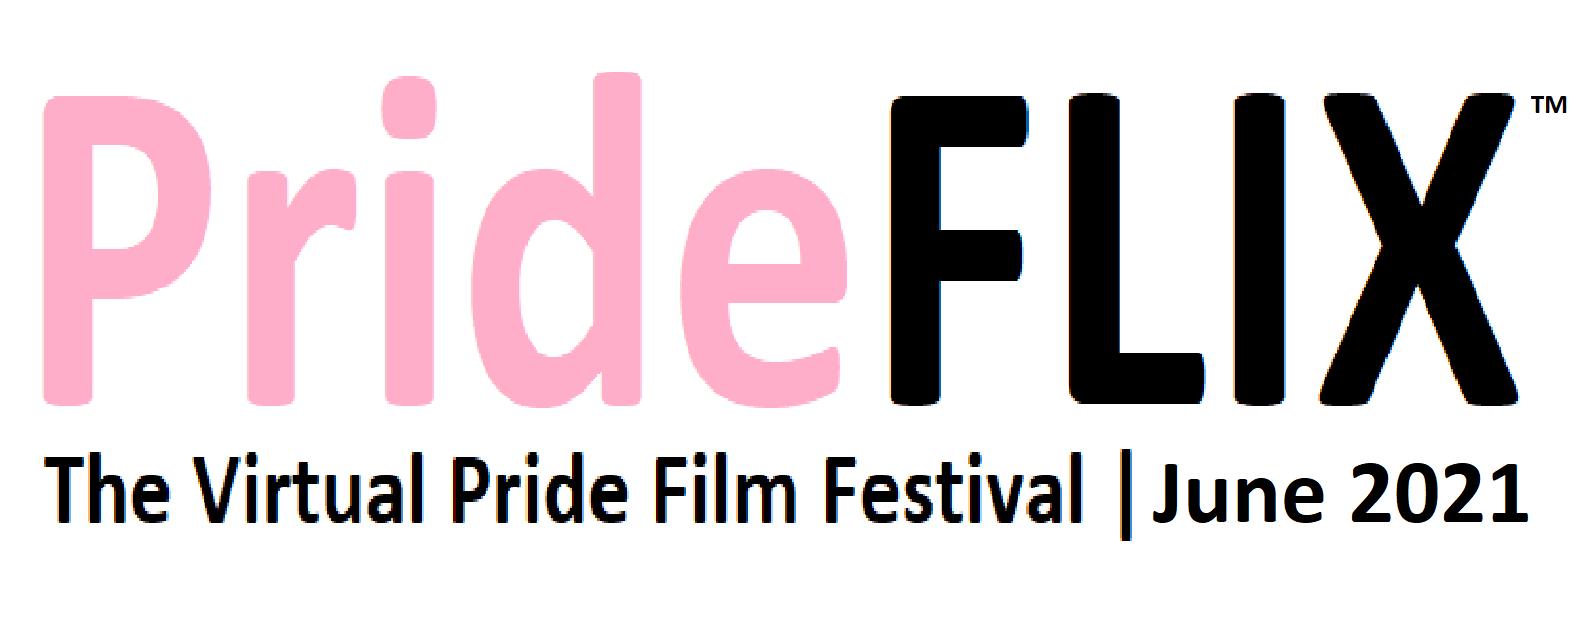 PrideFLIX; The Virtual LGBTQ+ Pride Film Festival